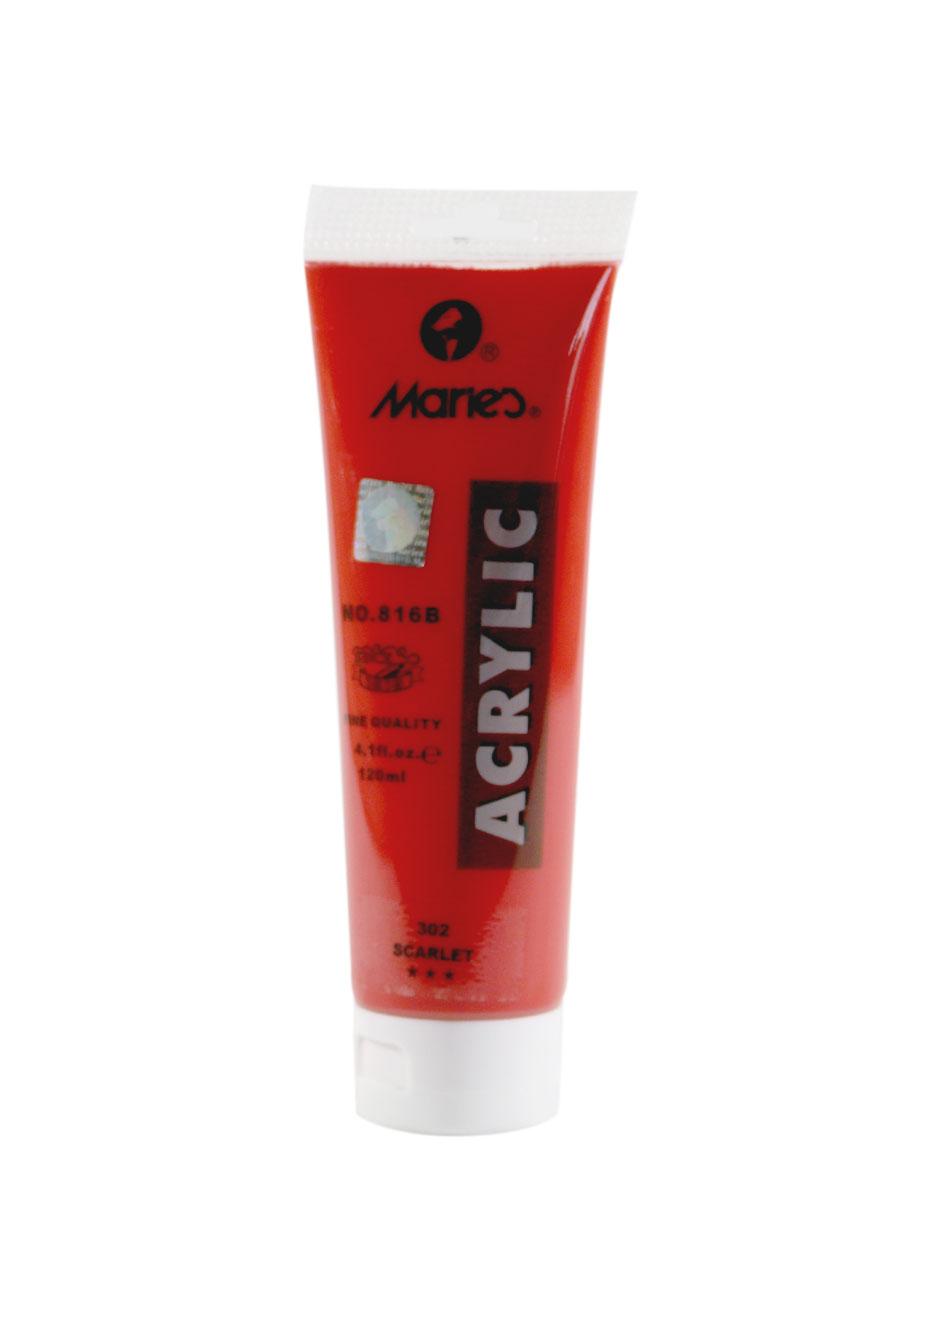 Maries-acrylic-scarlet-120-ml